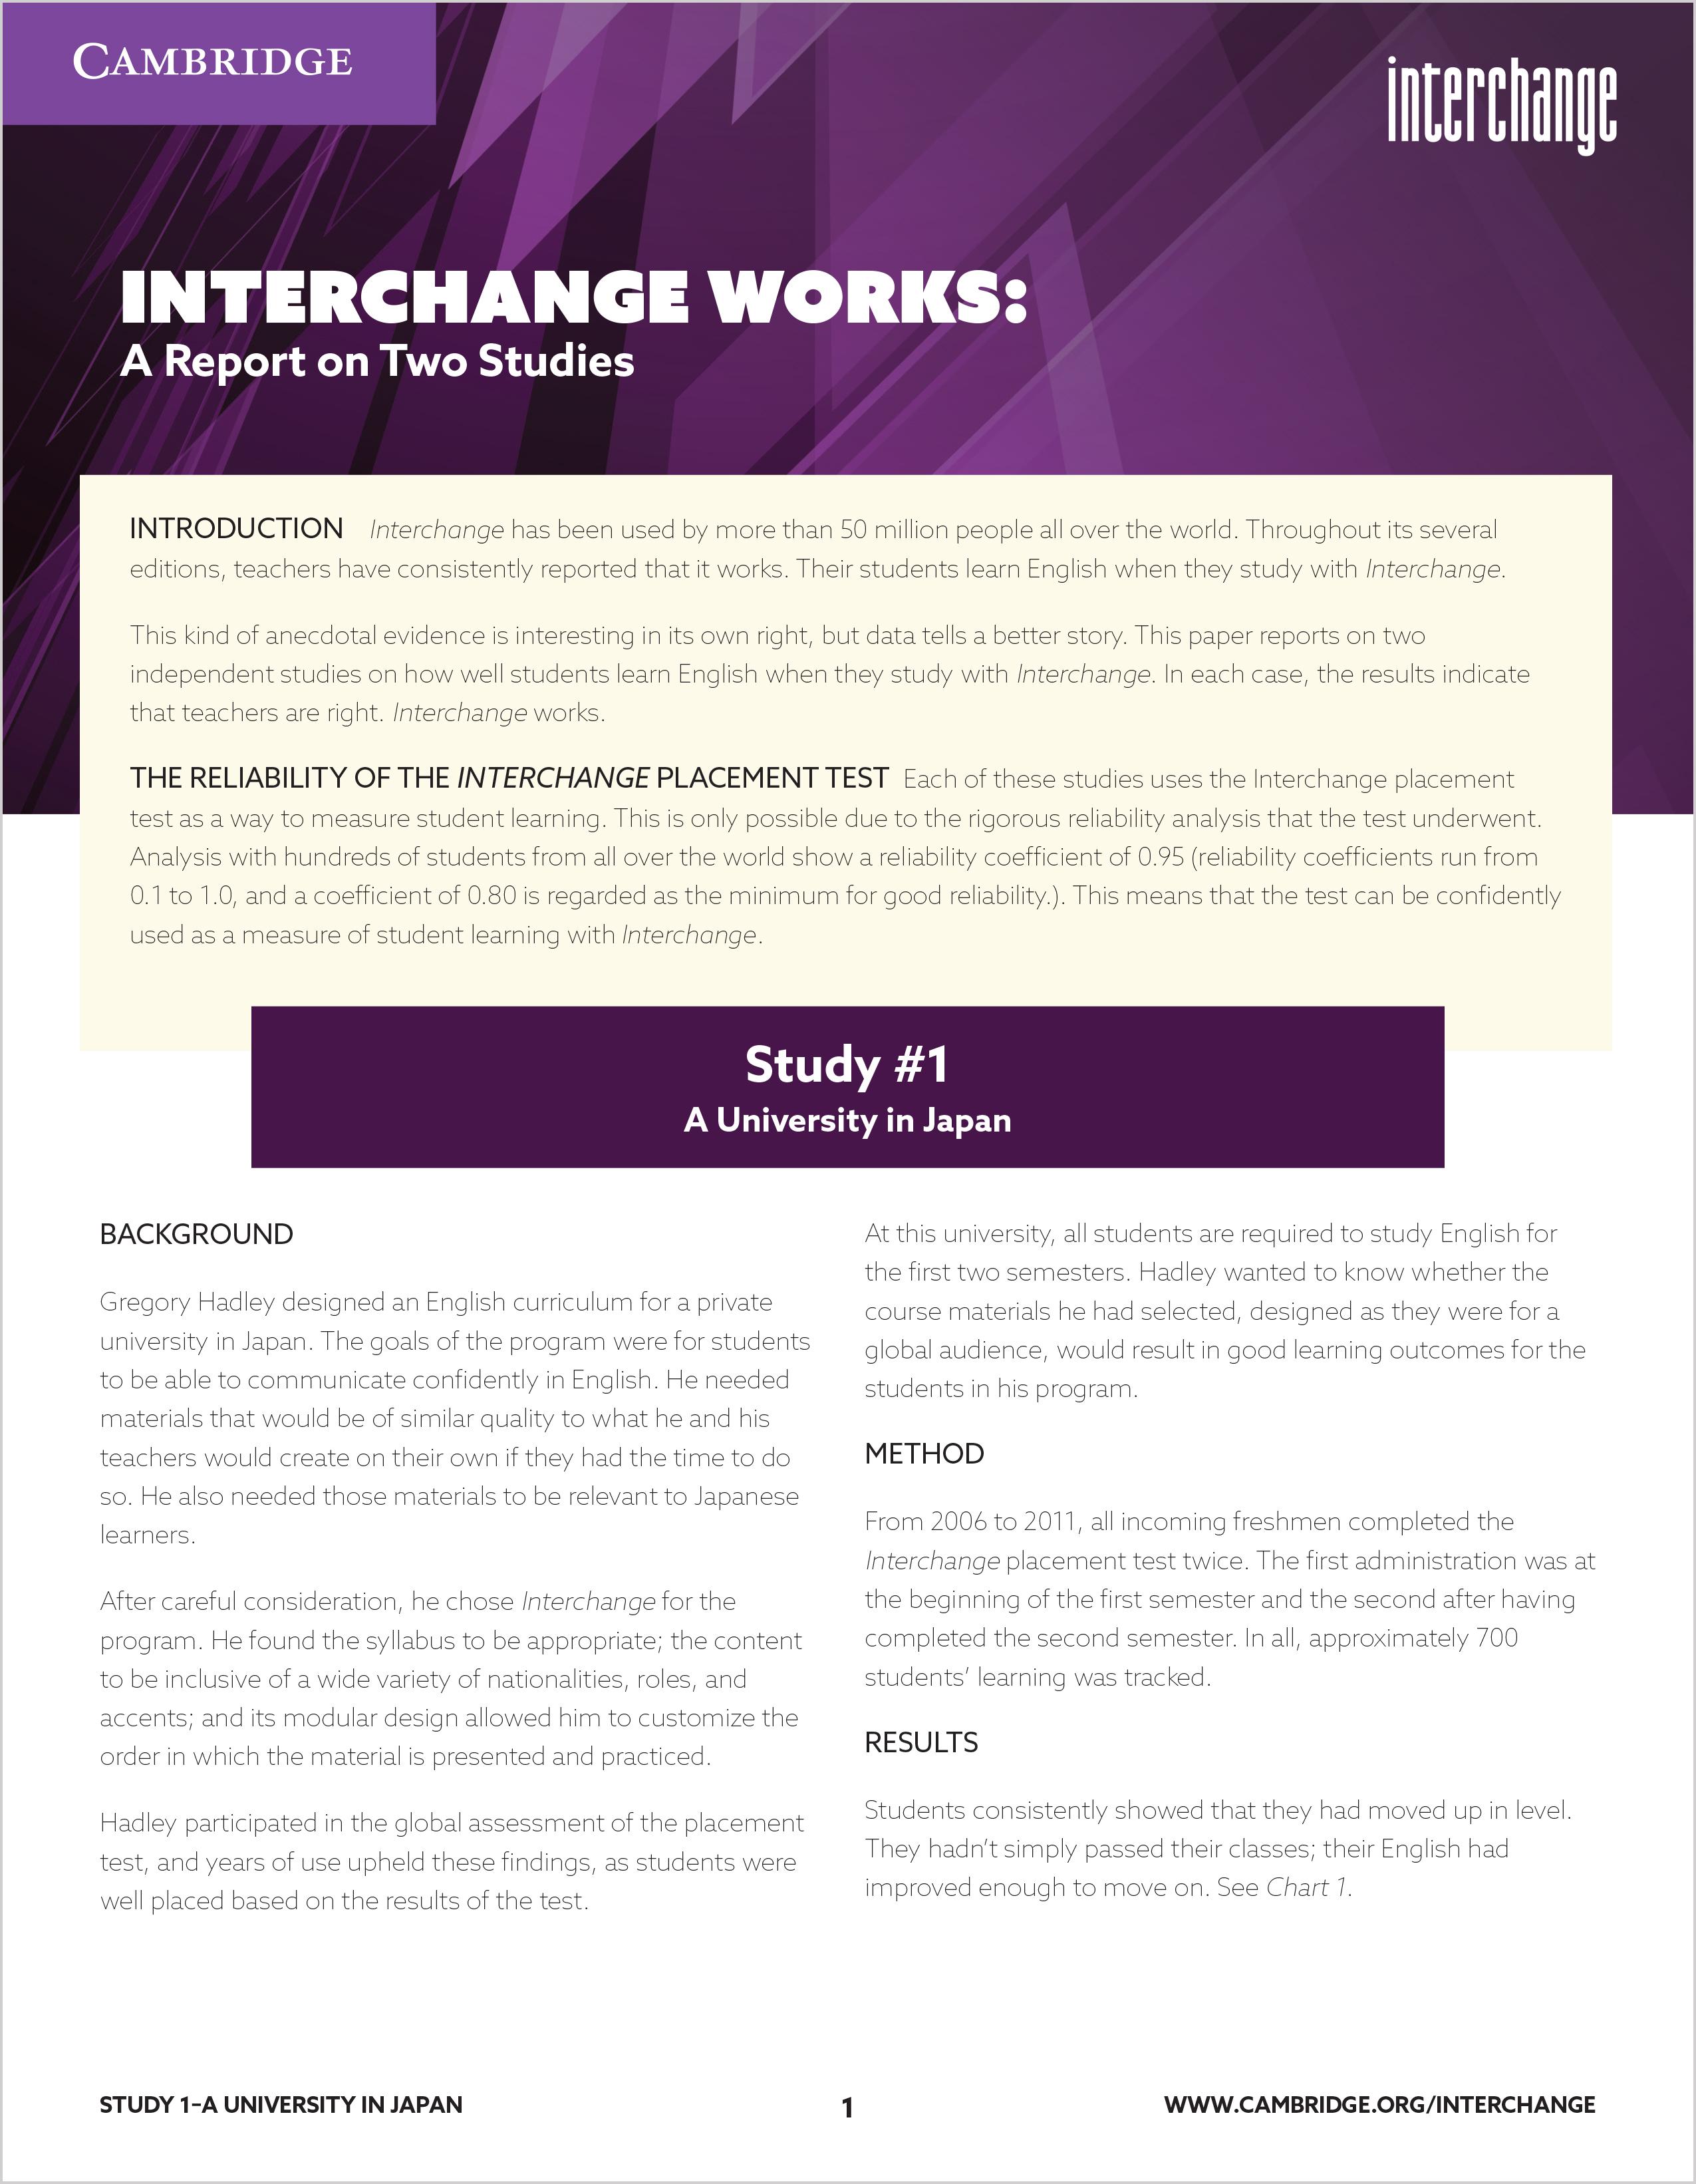 Interchange fifth edition adult young adult cambridge proven effective fandeluxe Gallery